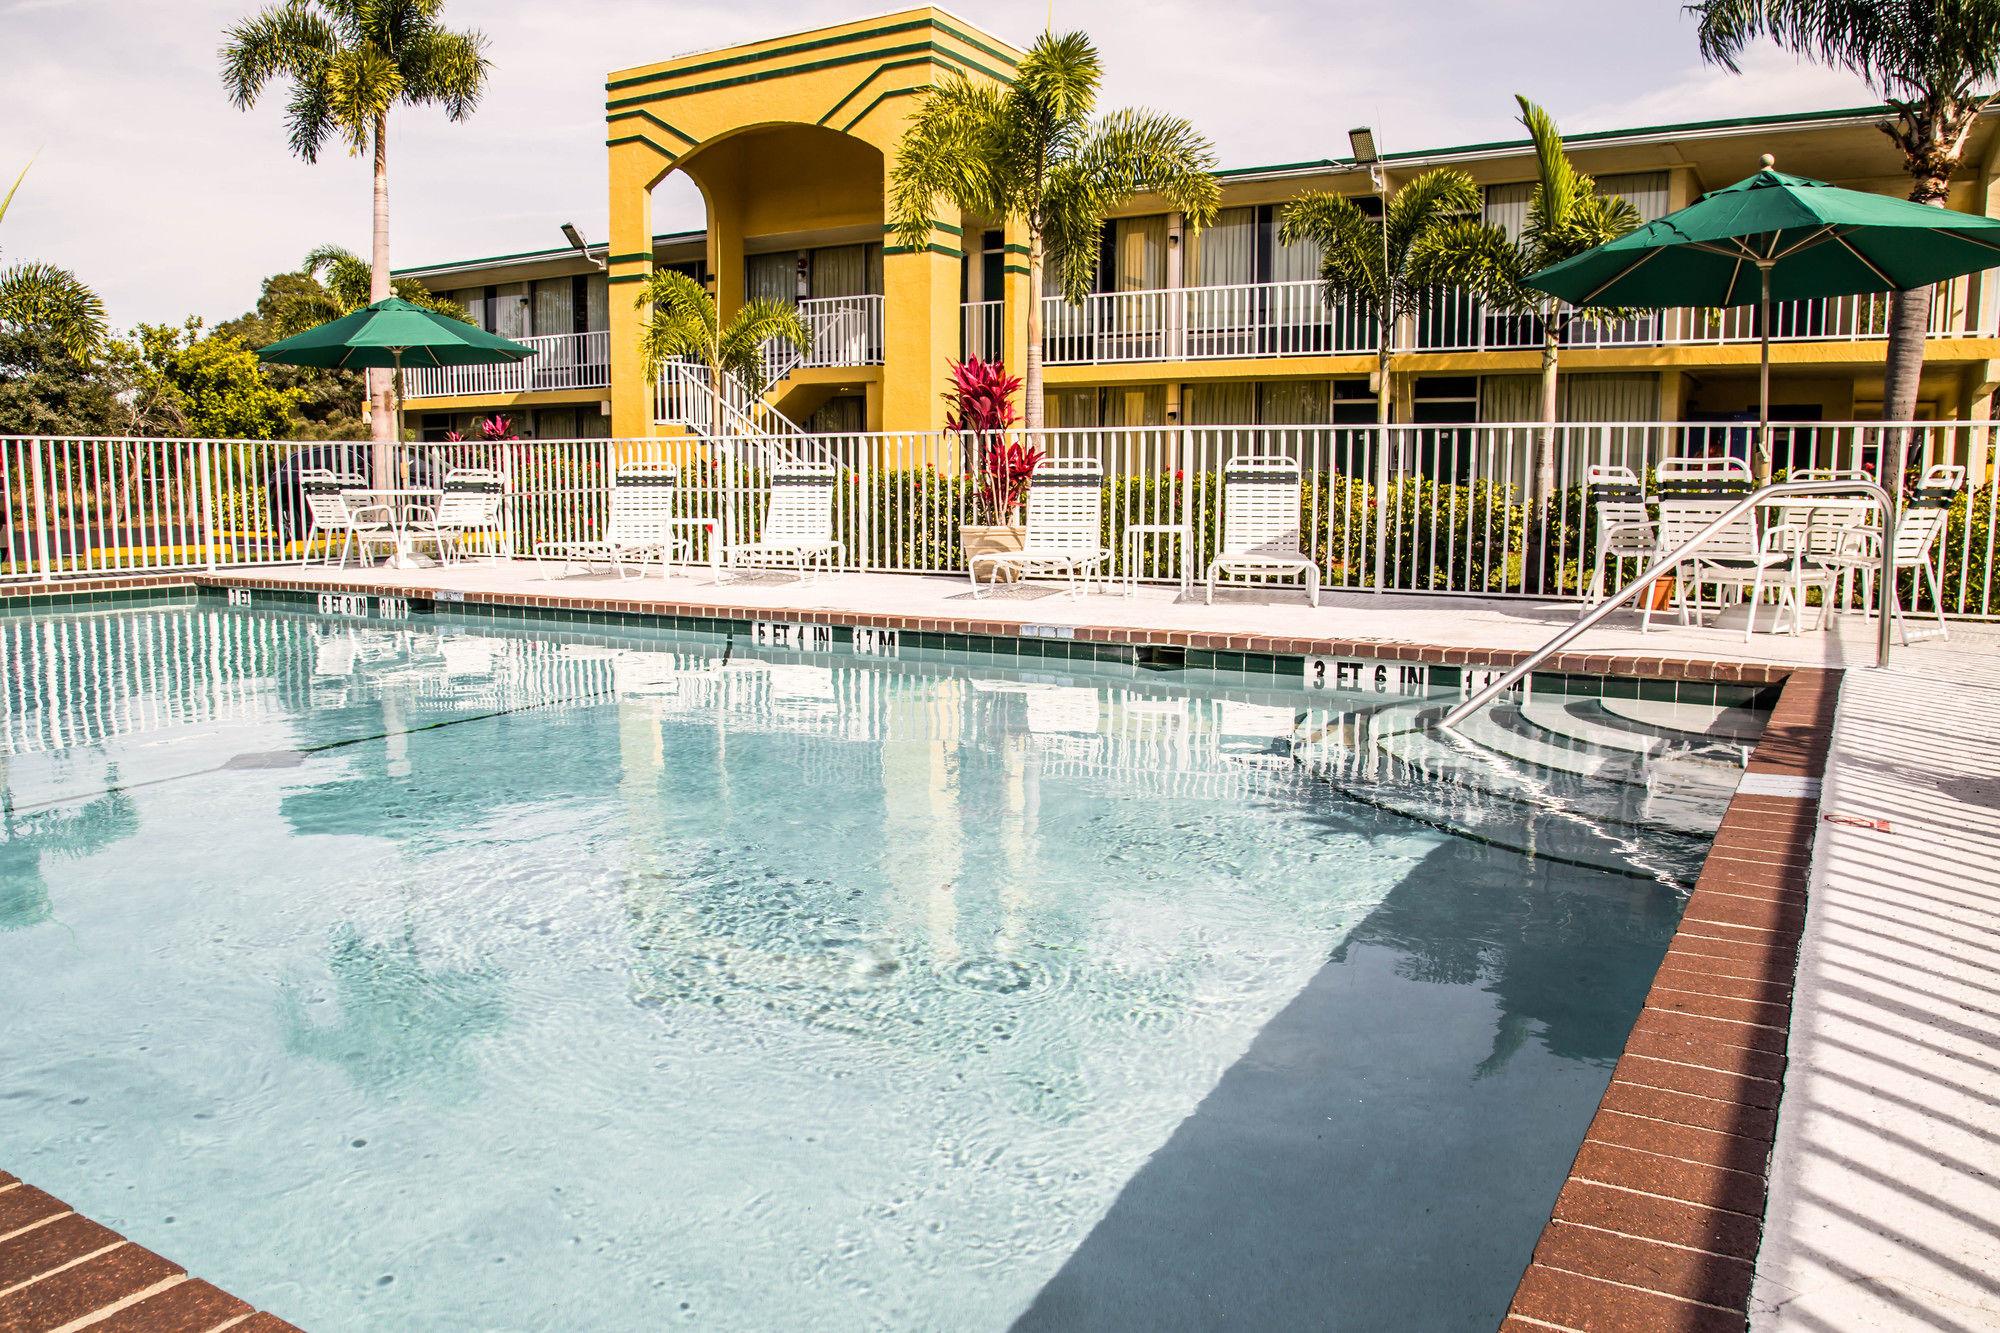 Bradenton Hotel Coupons for Bradenton Florida  FreeHotelCouponscom